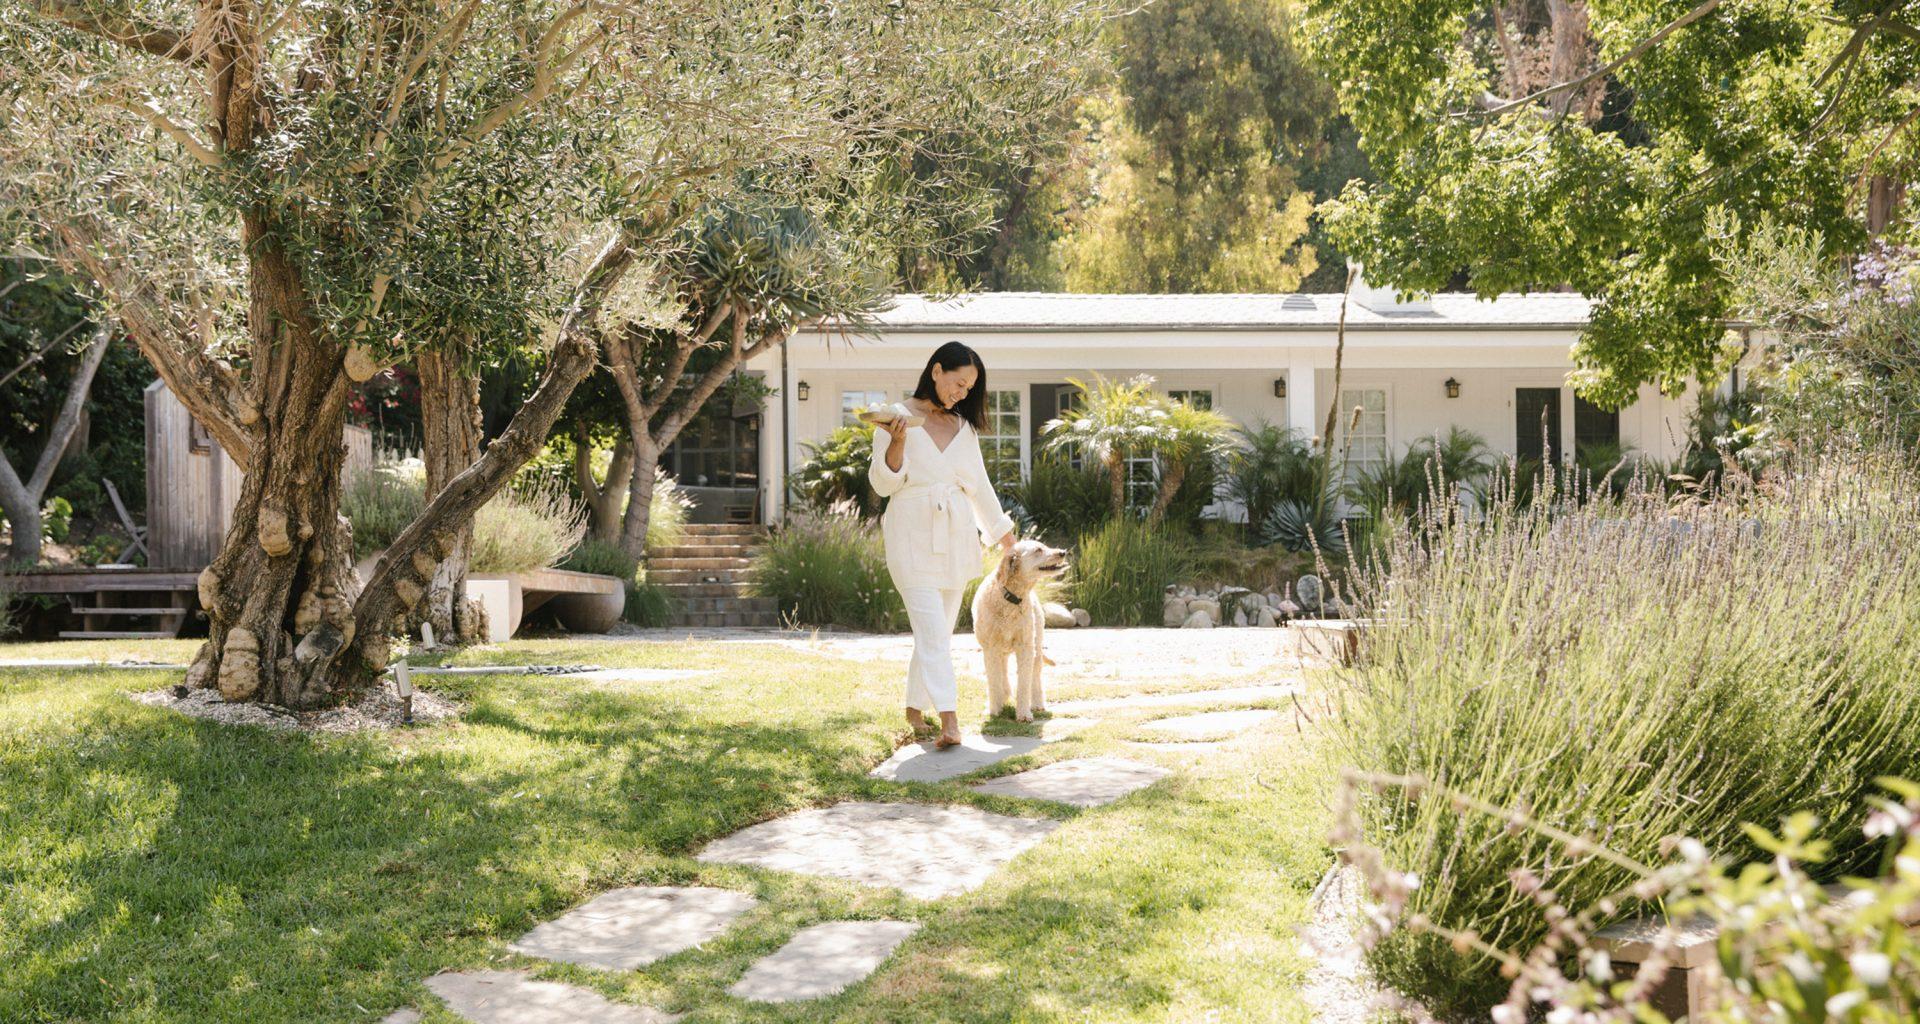 Pacific Natural At Home Digital Exclusive: Simone Harrer